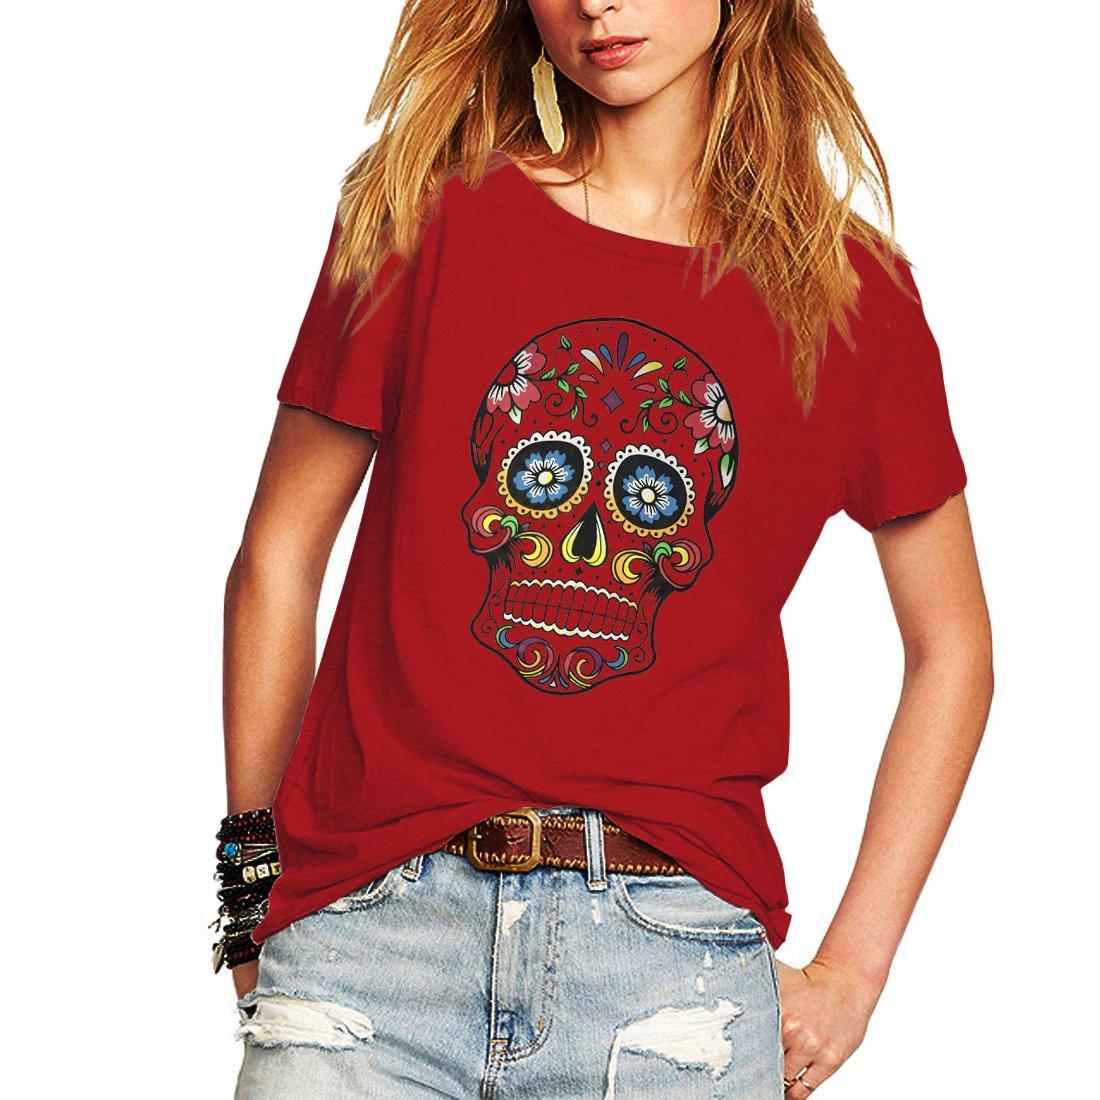 97e37aac5 Weigou Woman T Shirt Floral Skull Contrast Color Junior Tops Tee Punk  Street Style Lady Shirt